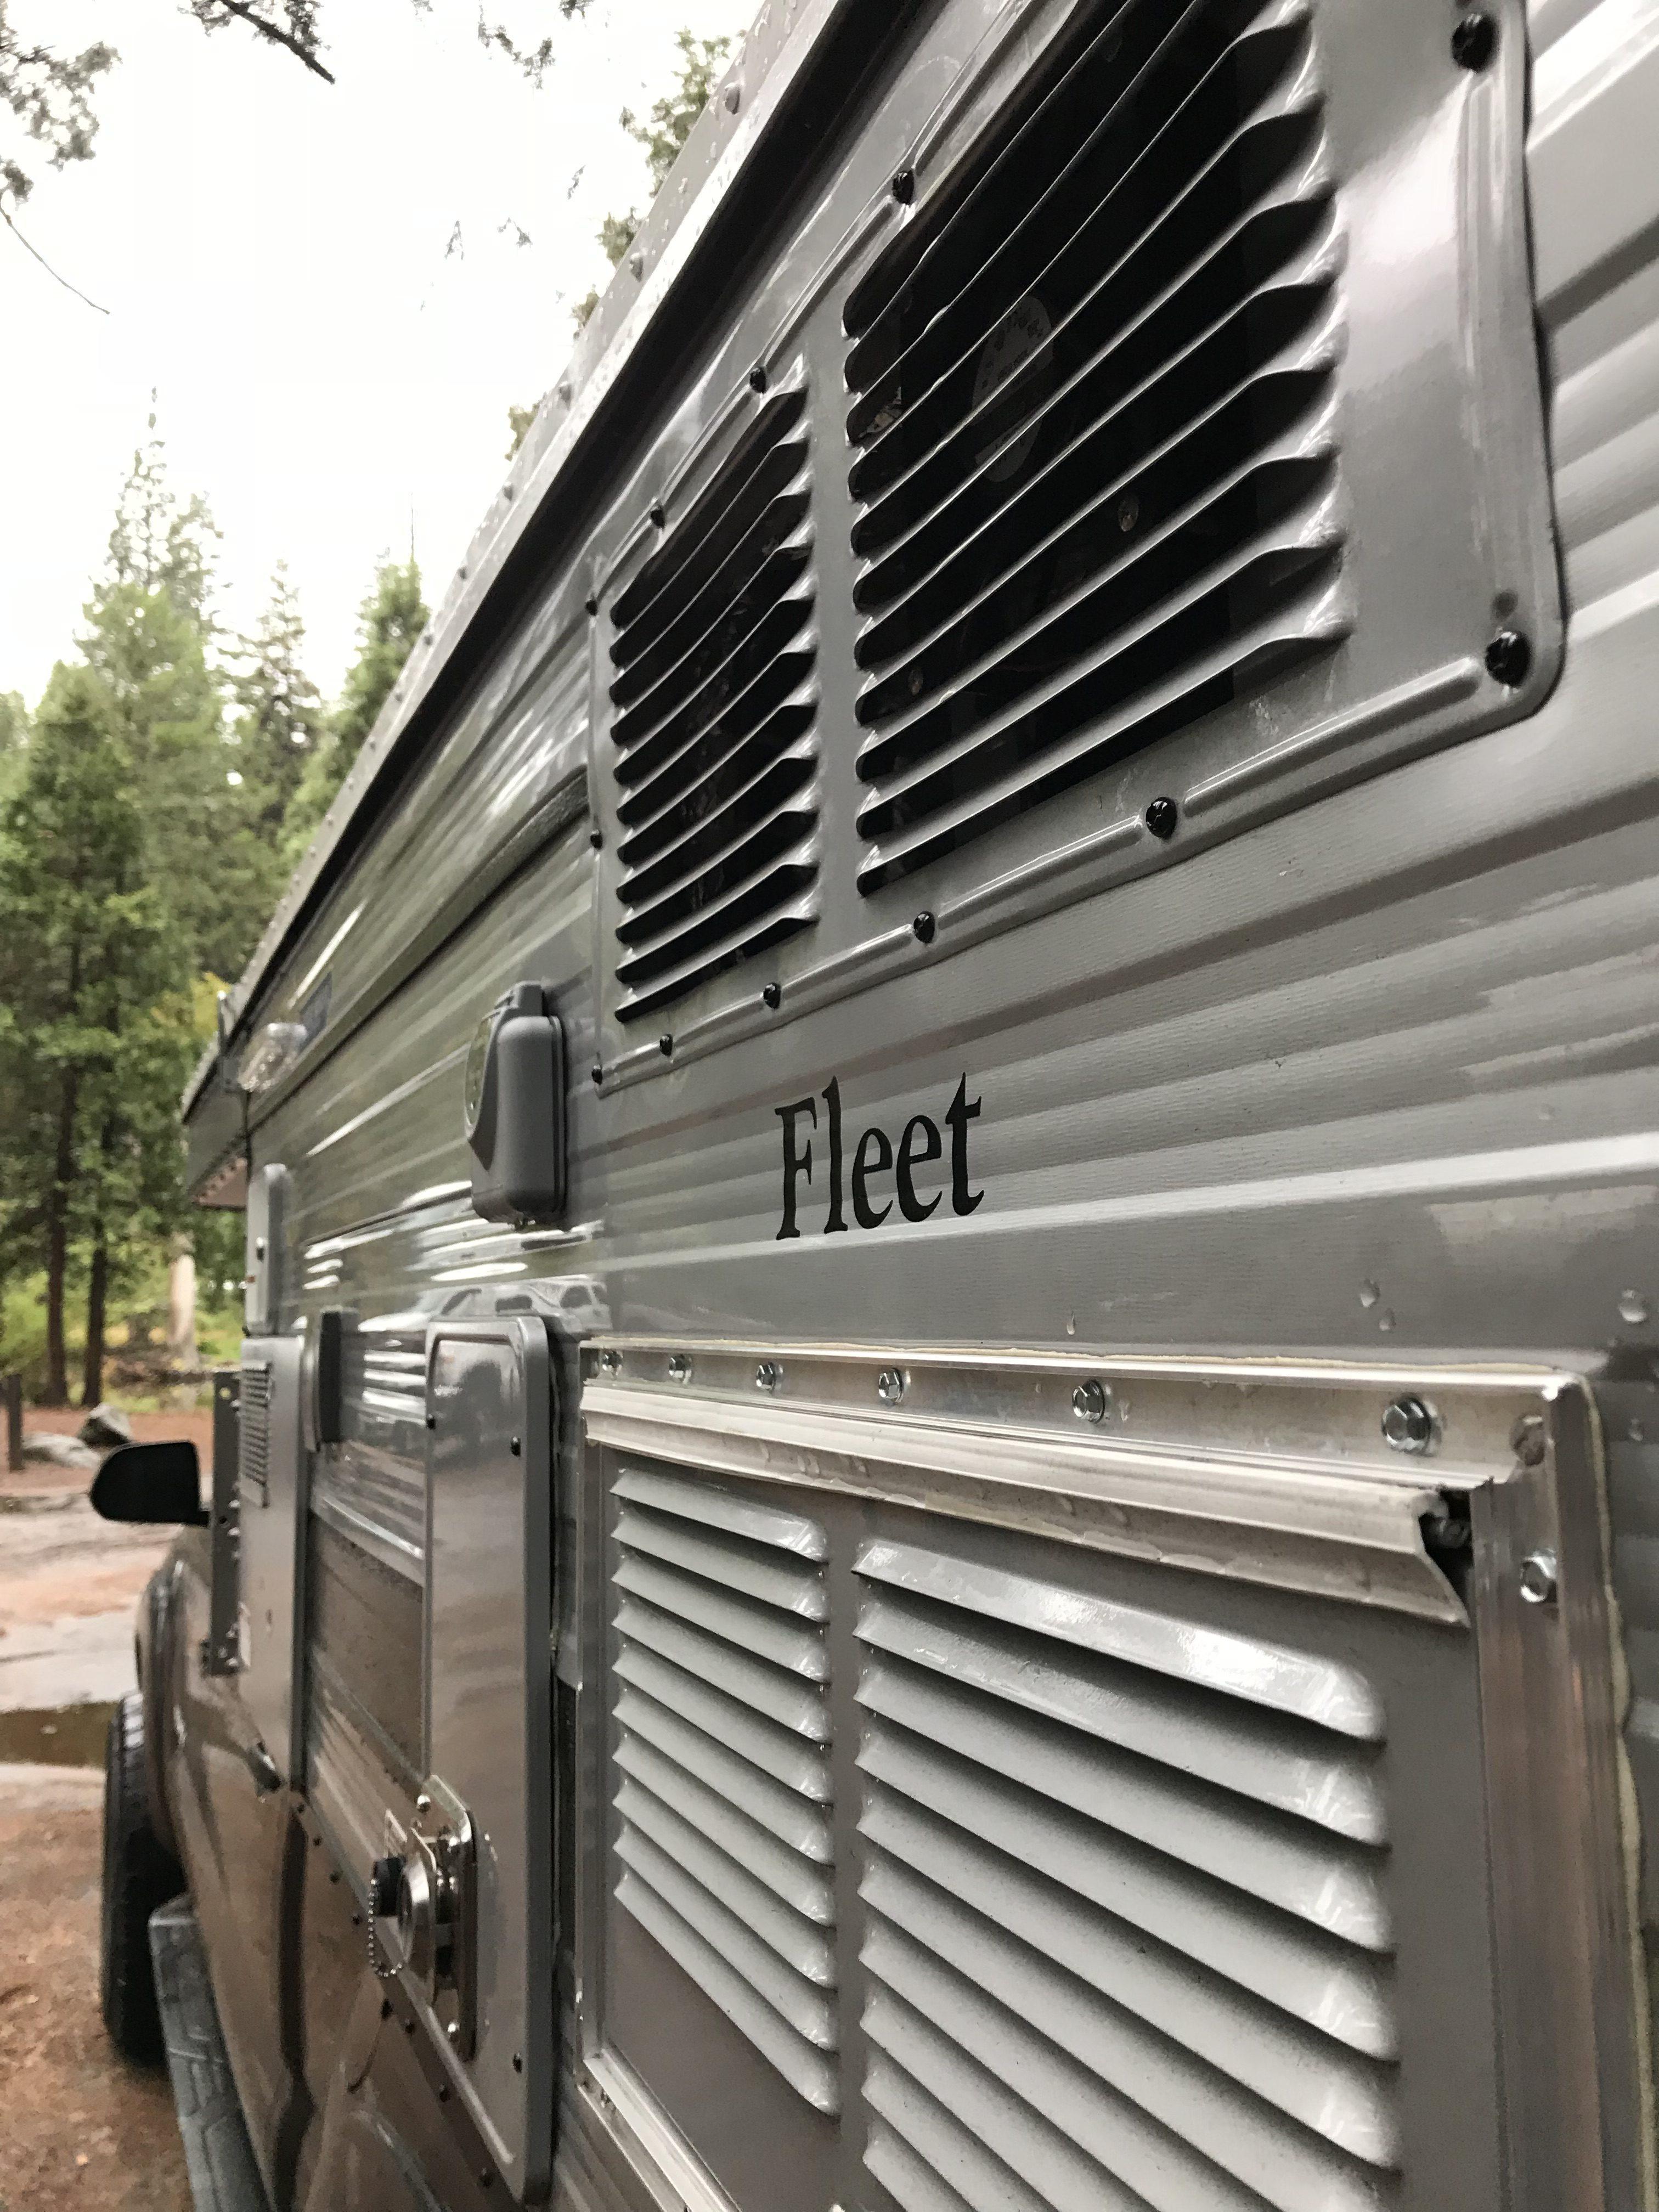 Four Wheel Campers - Fleet logo